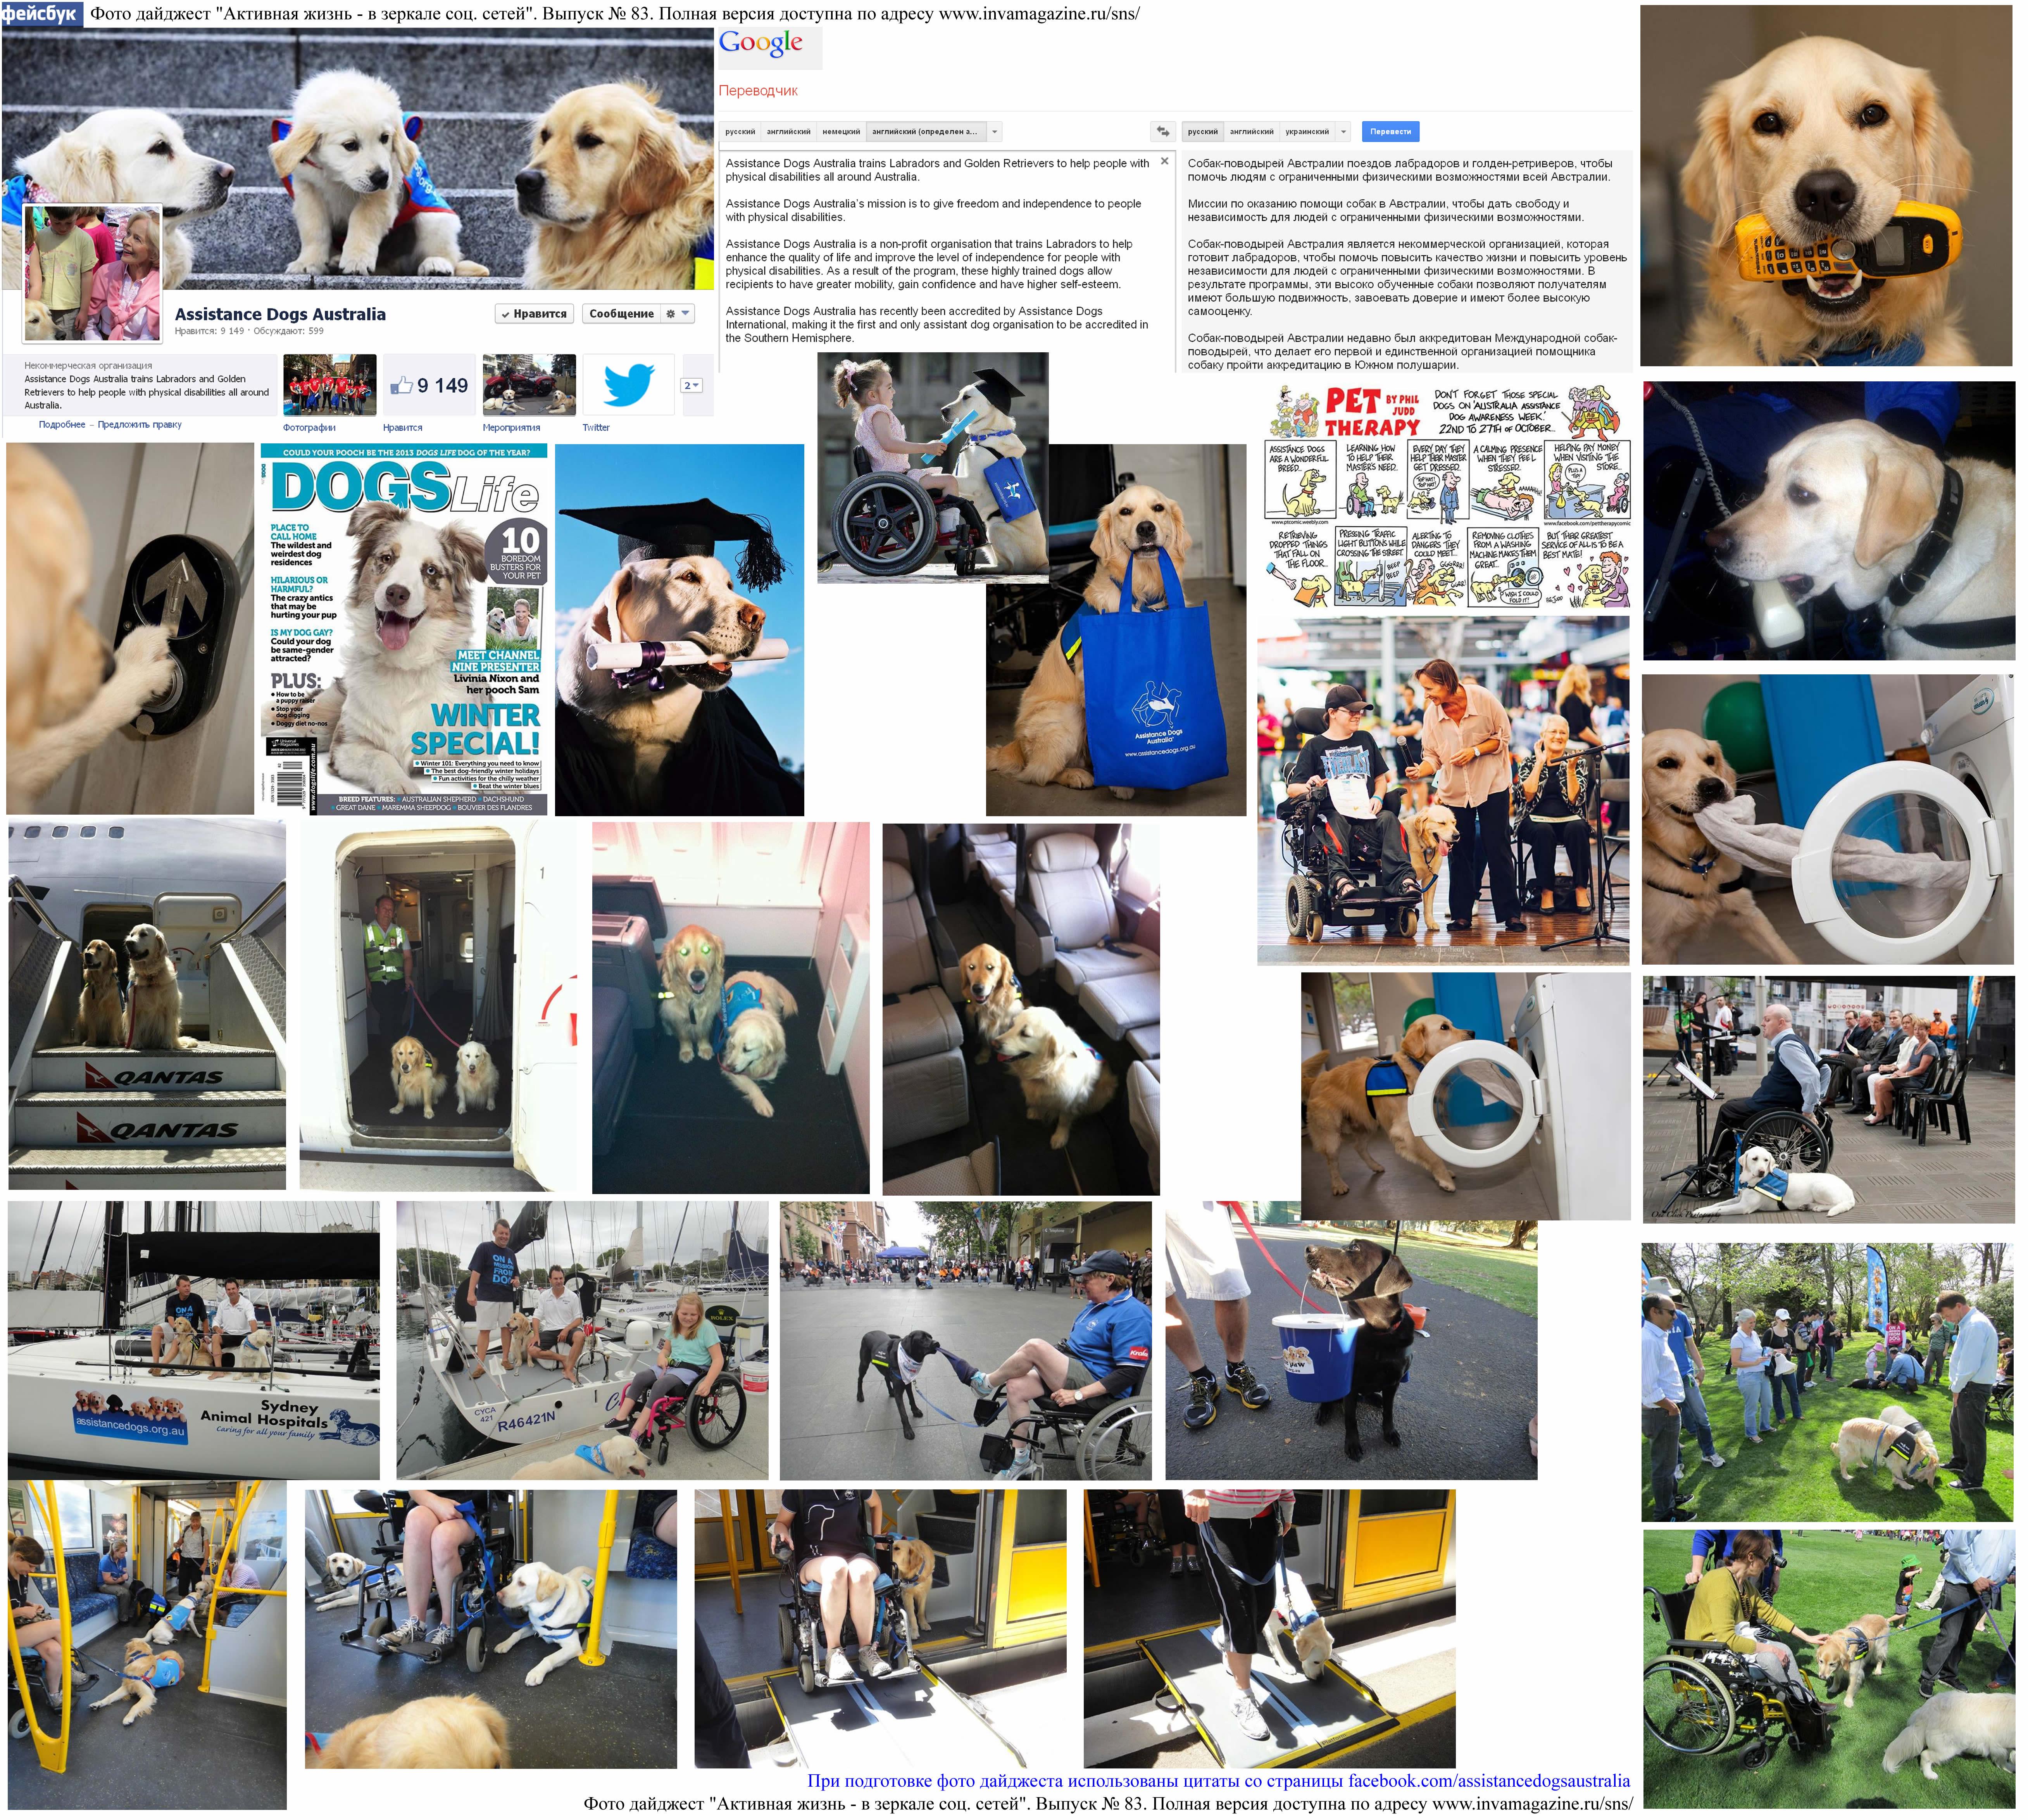 Фото дайджест страницы Assistance Dogs Australia